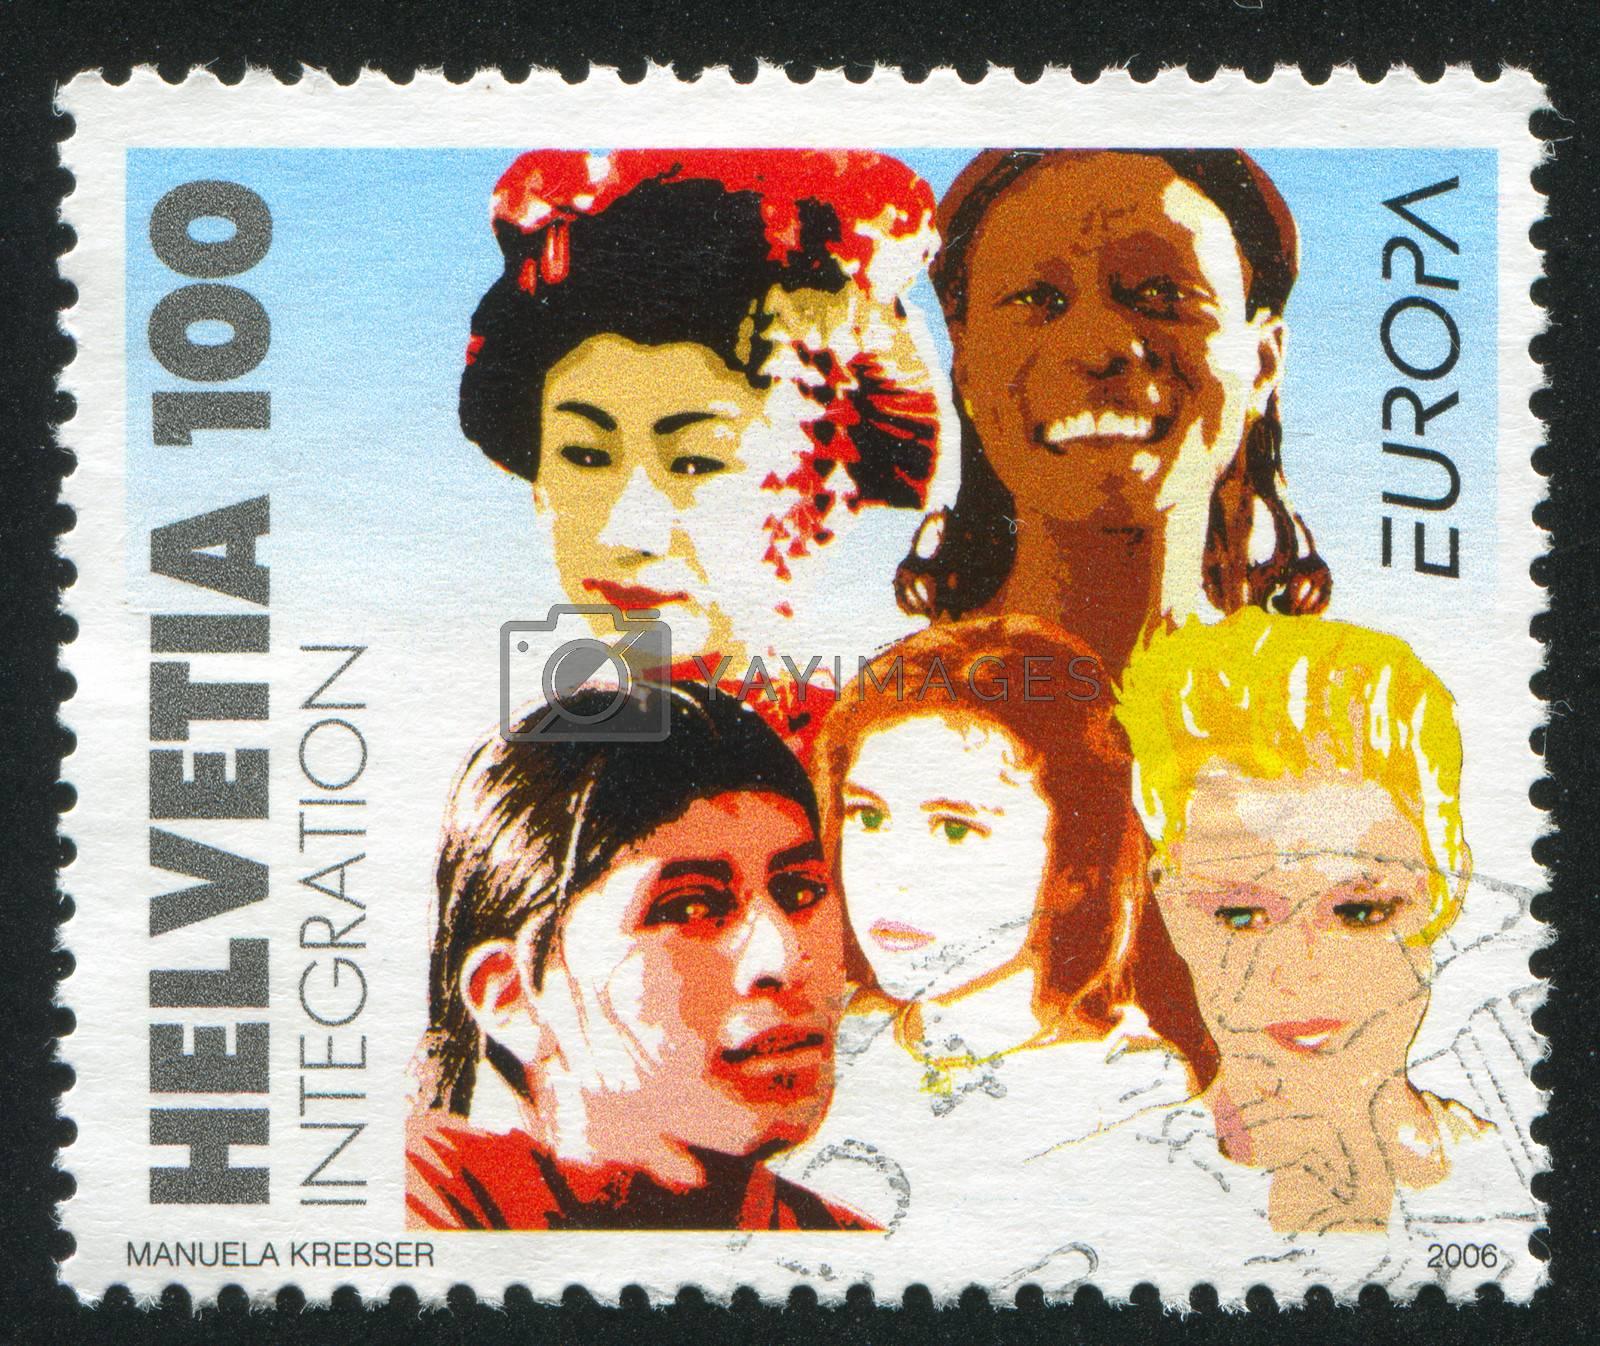 SWITZERLAND - CIRCA 2006: stamp printed by Switzerland, shows People, circa 2006